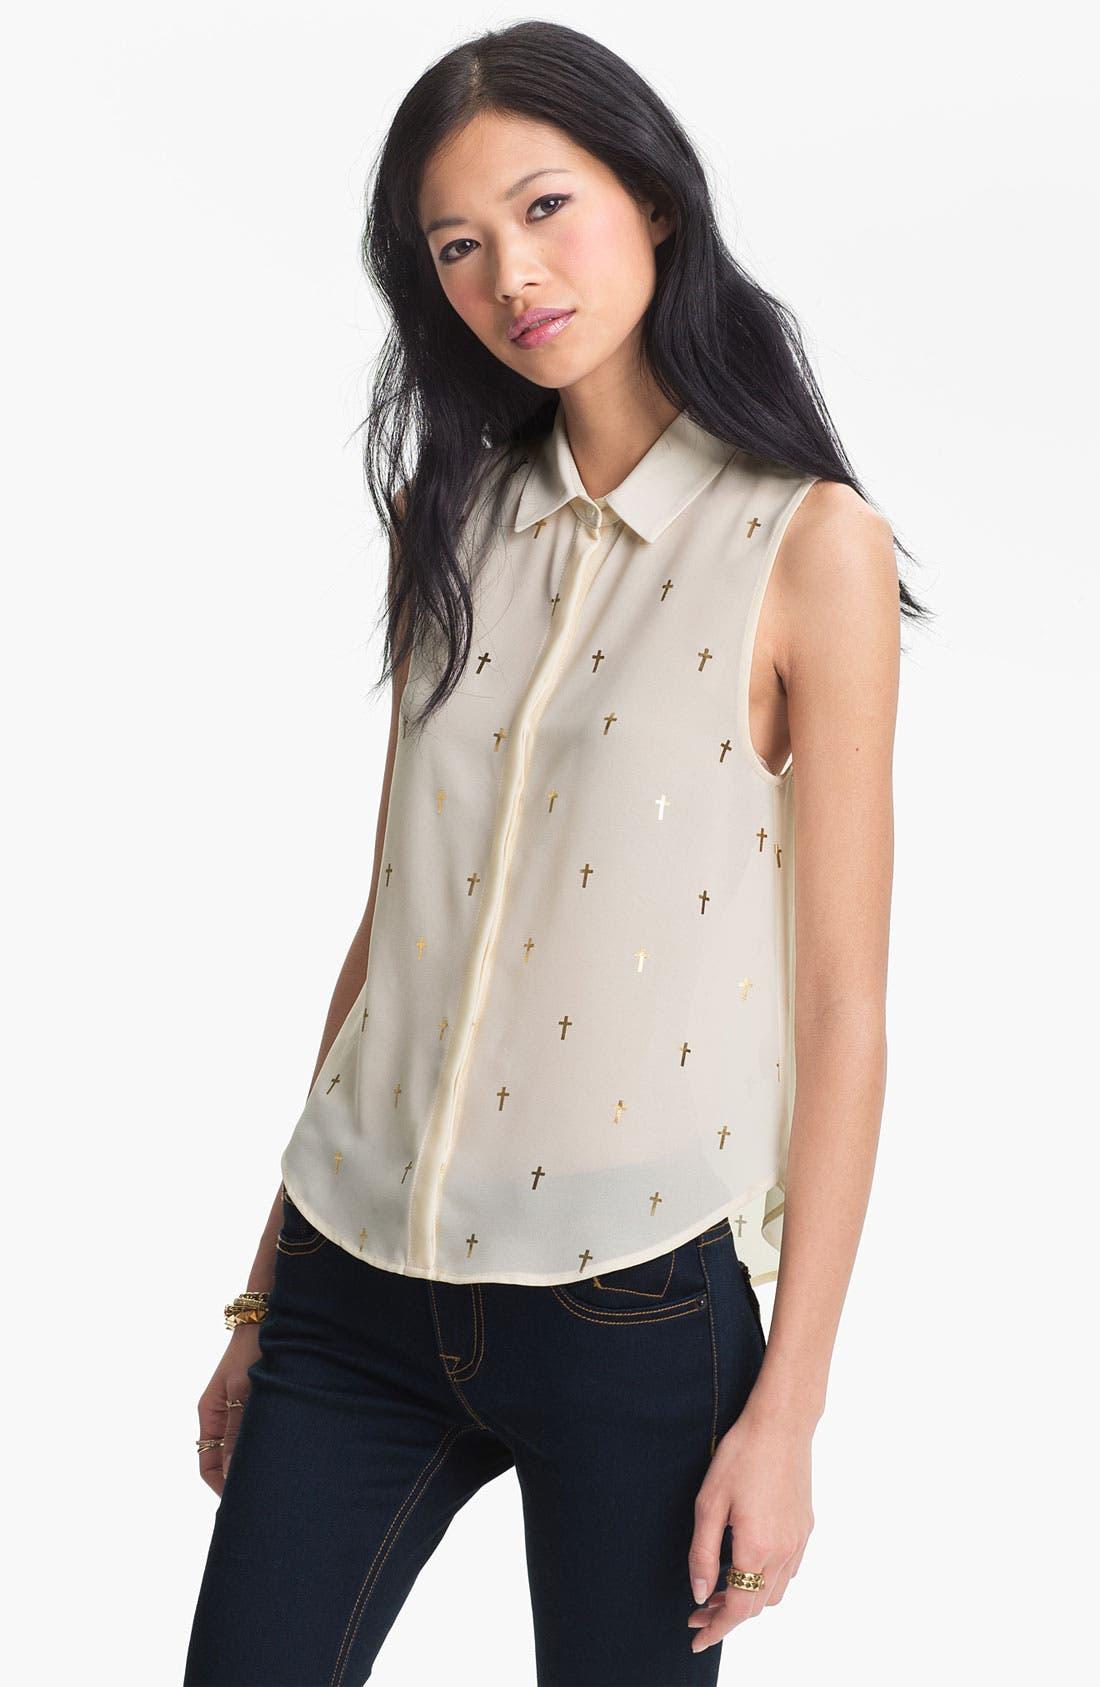 Alternate Image 1 Selected - Elodie Gold Cross Print Chiffon Shirt (Juniors)